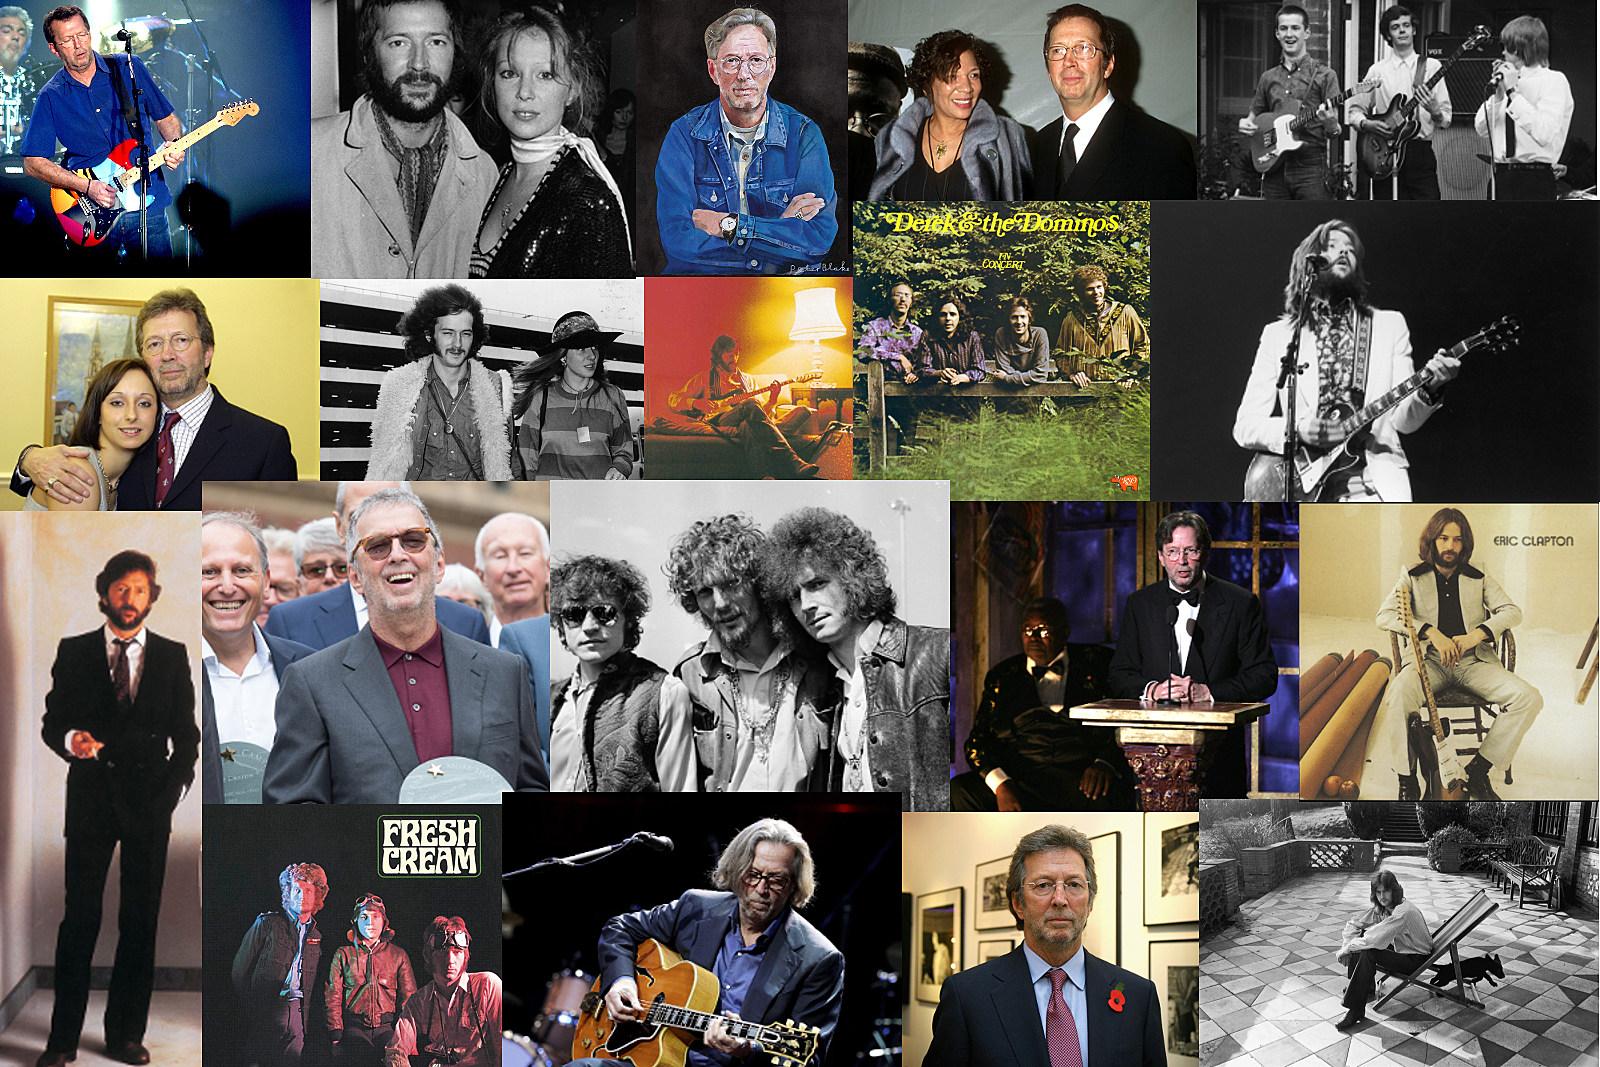 Eric Clapton Through the Years: 1964-2018 Photos